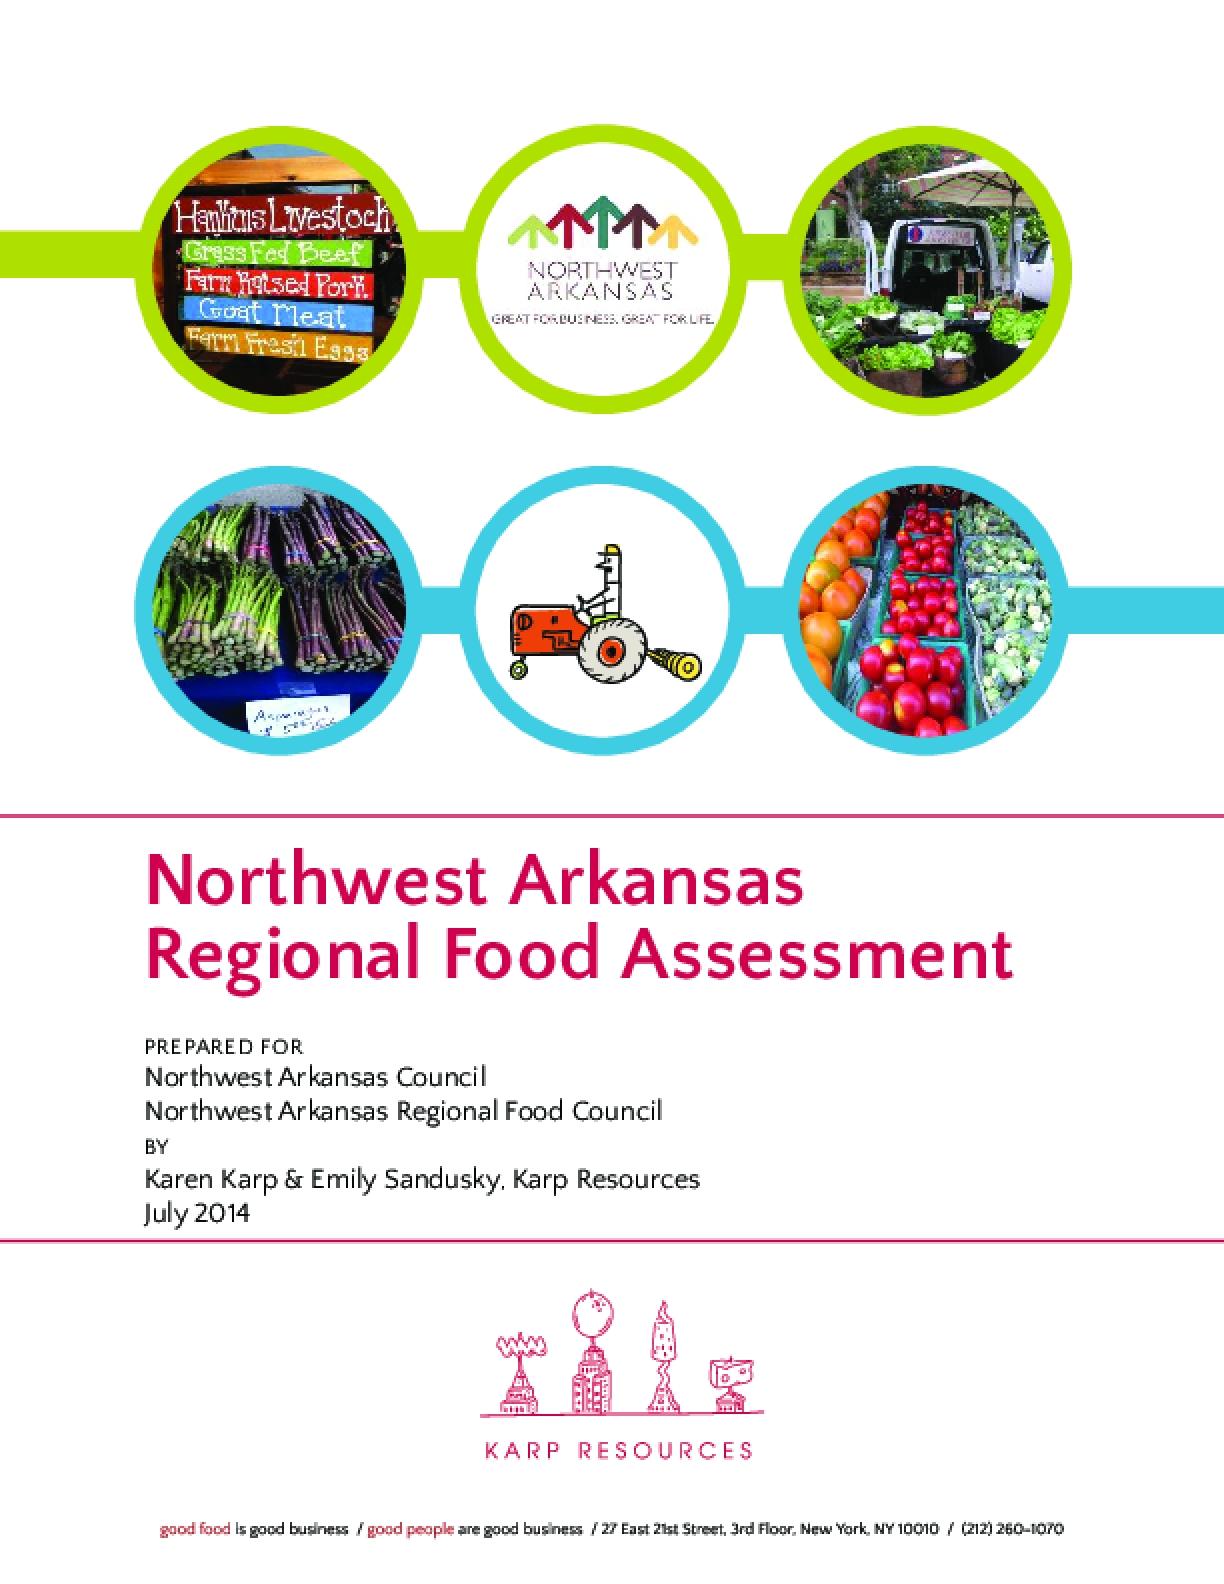 Northwest Arkansas Regional Food Assessment